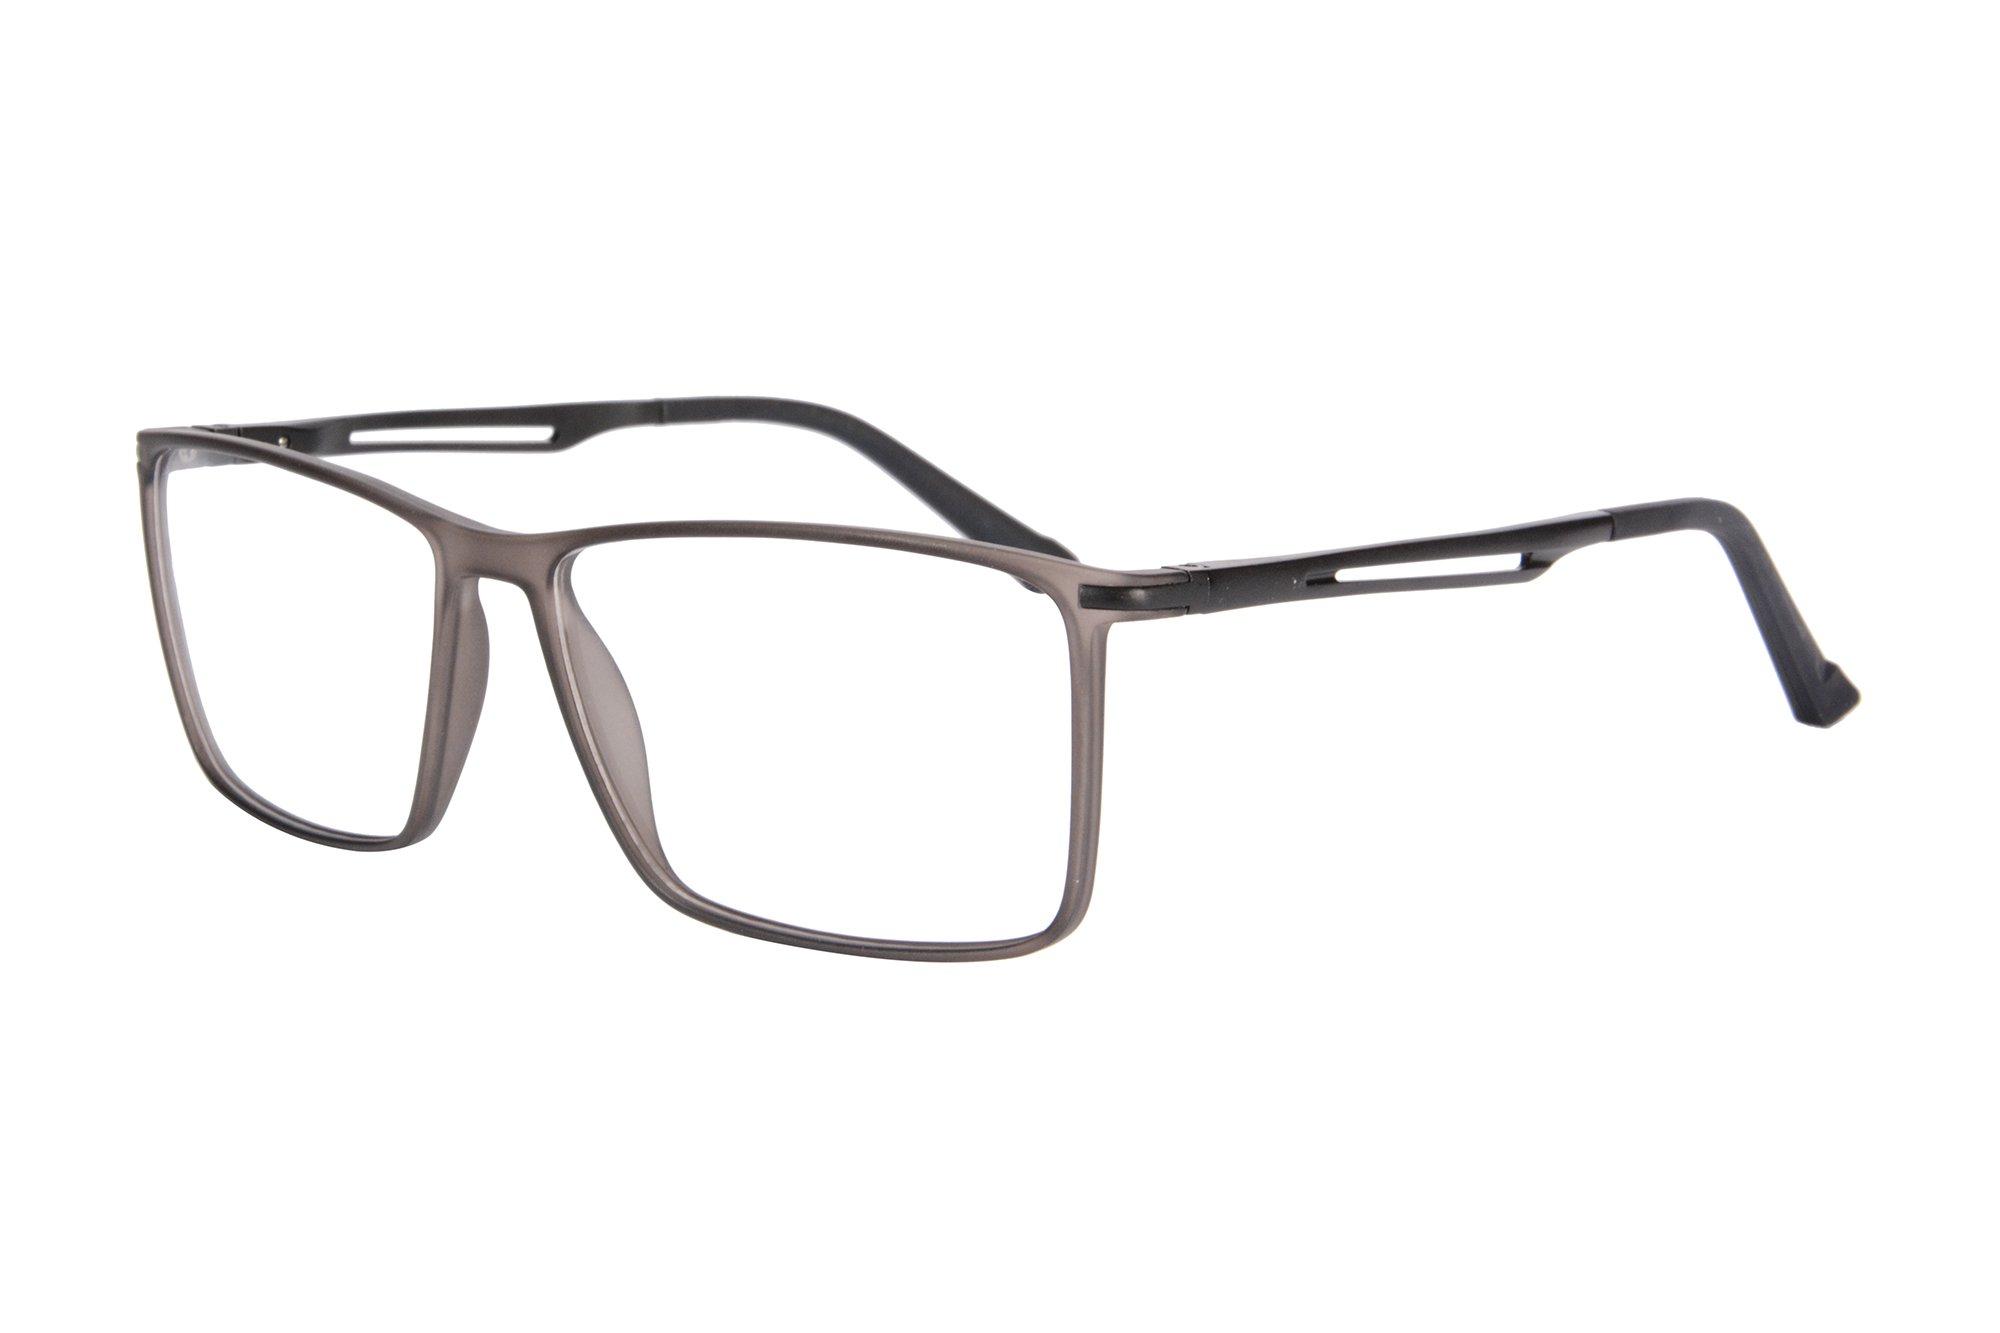 SHINU Progressive Multifocal Anti Blue Light Reading Glasses Multifocus Blue Light Blocking Reading Computer Reading Glasses-SH025